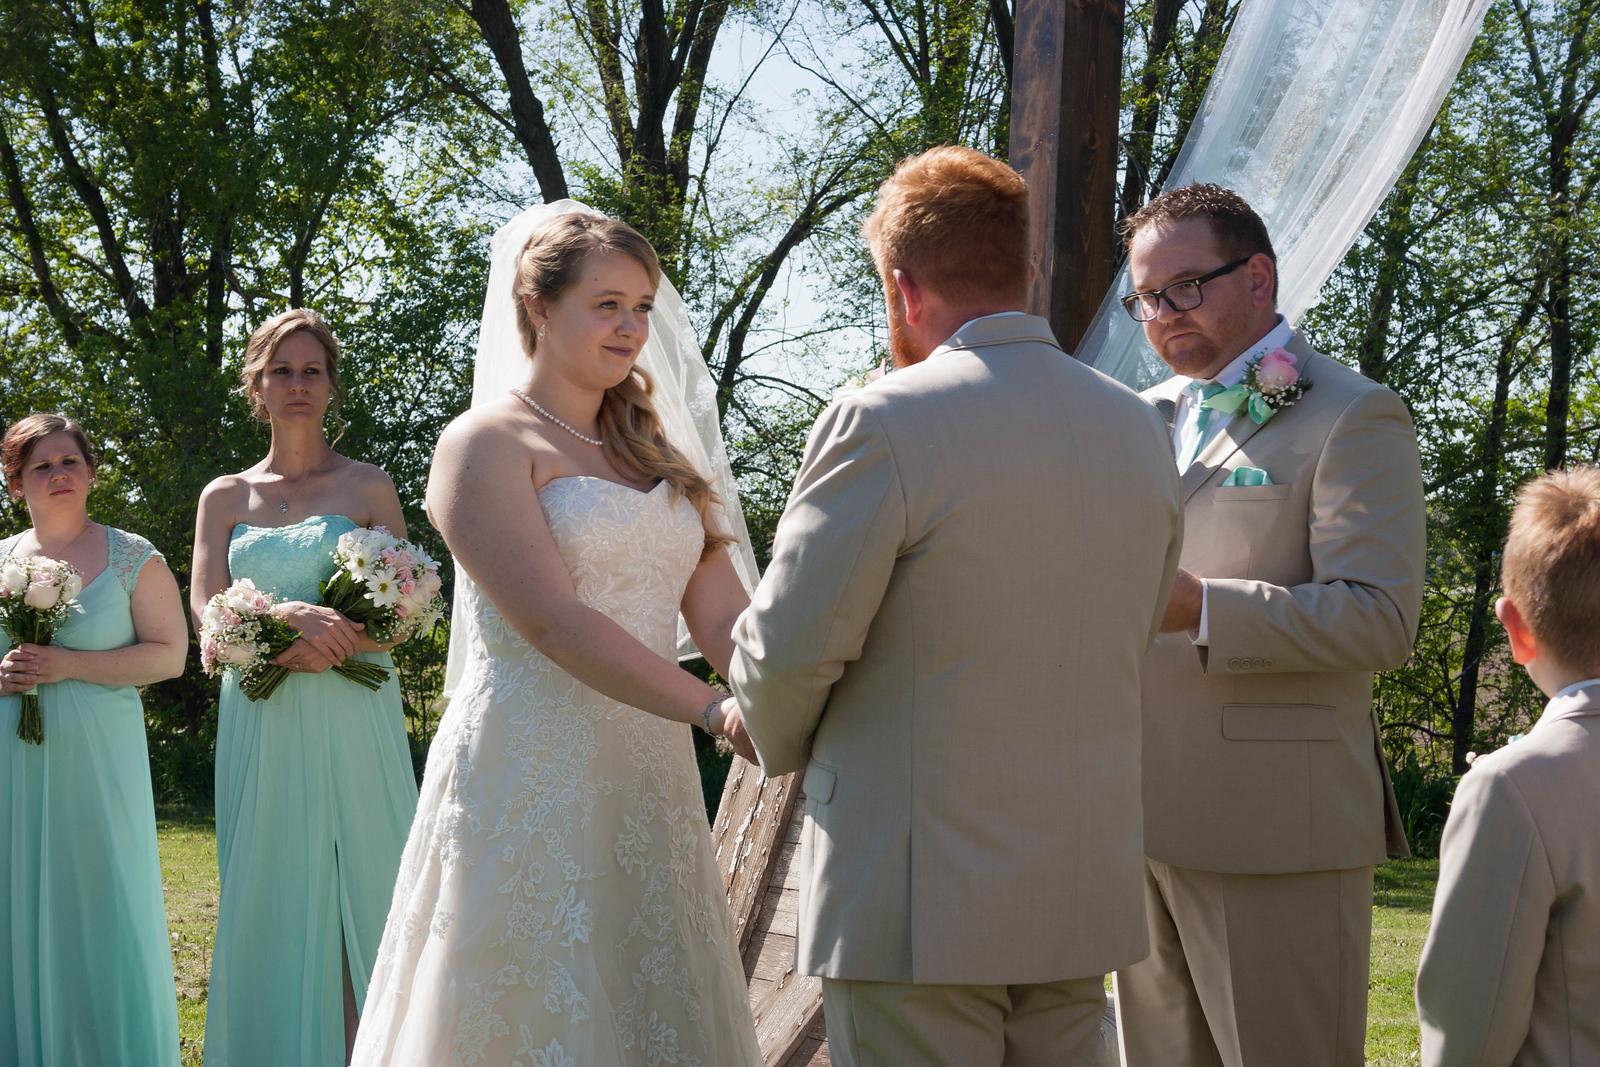 Jenna Kaye Ann Bengtson Daniel John Bulling  May 6, 2017